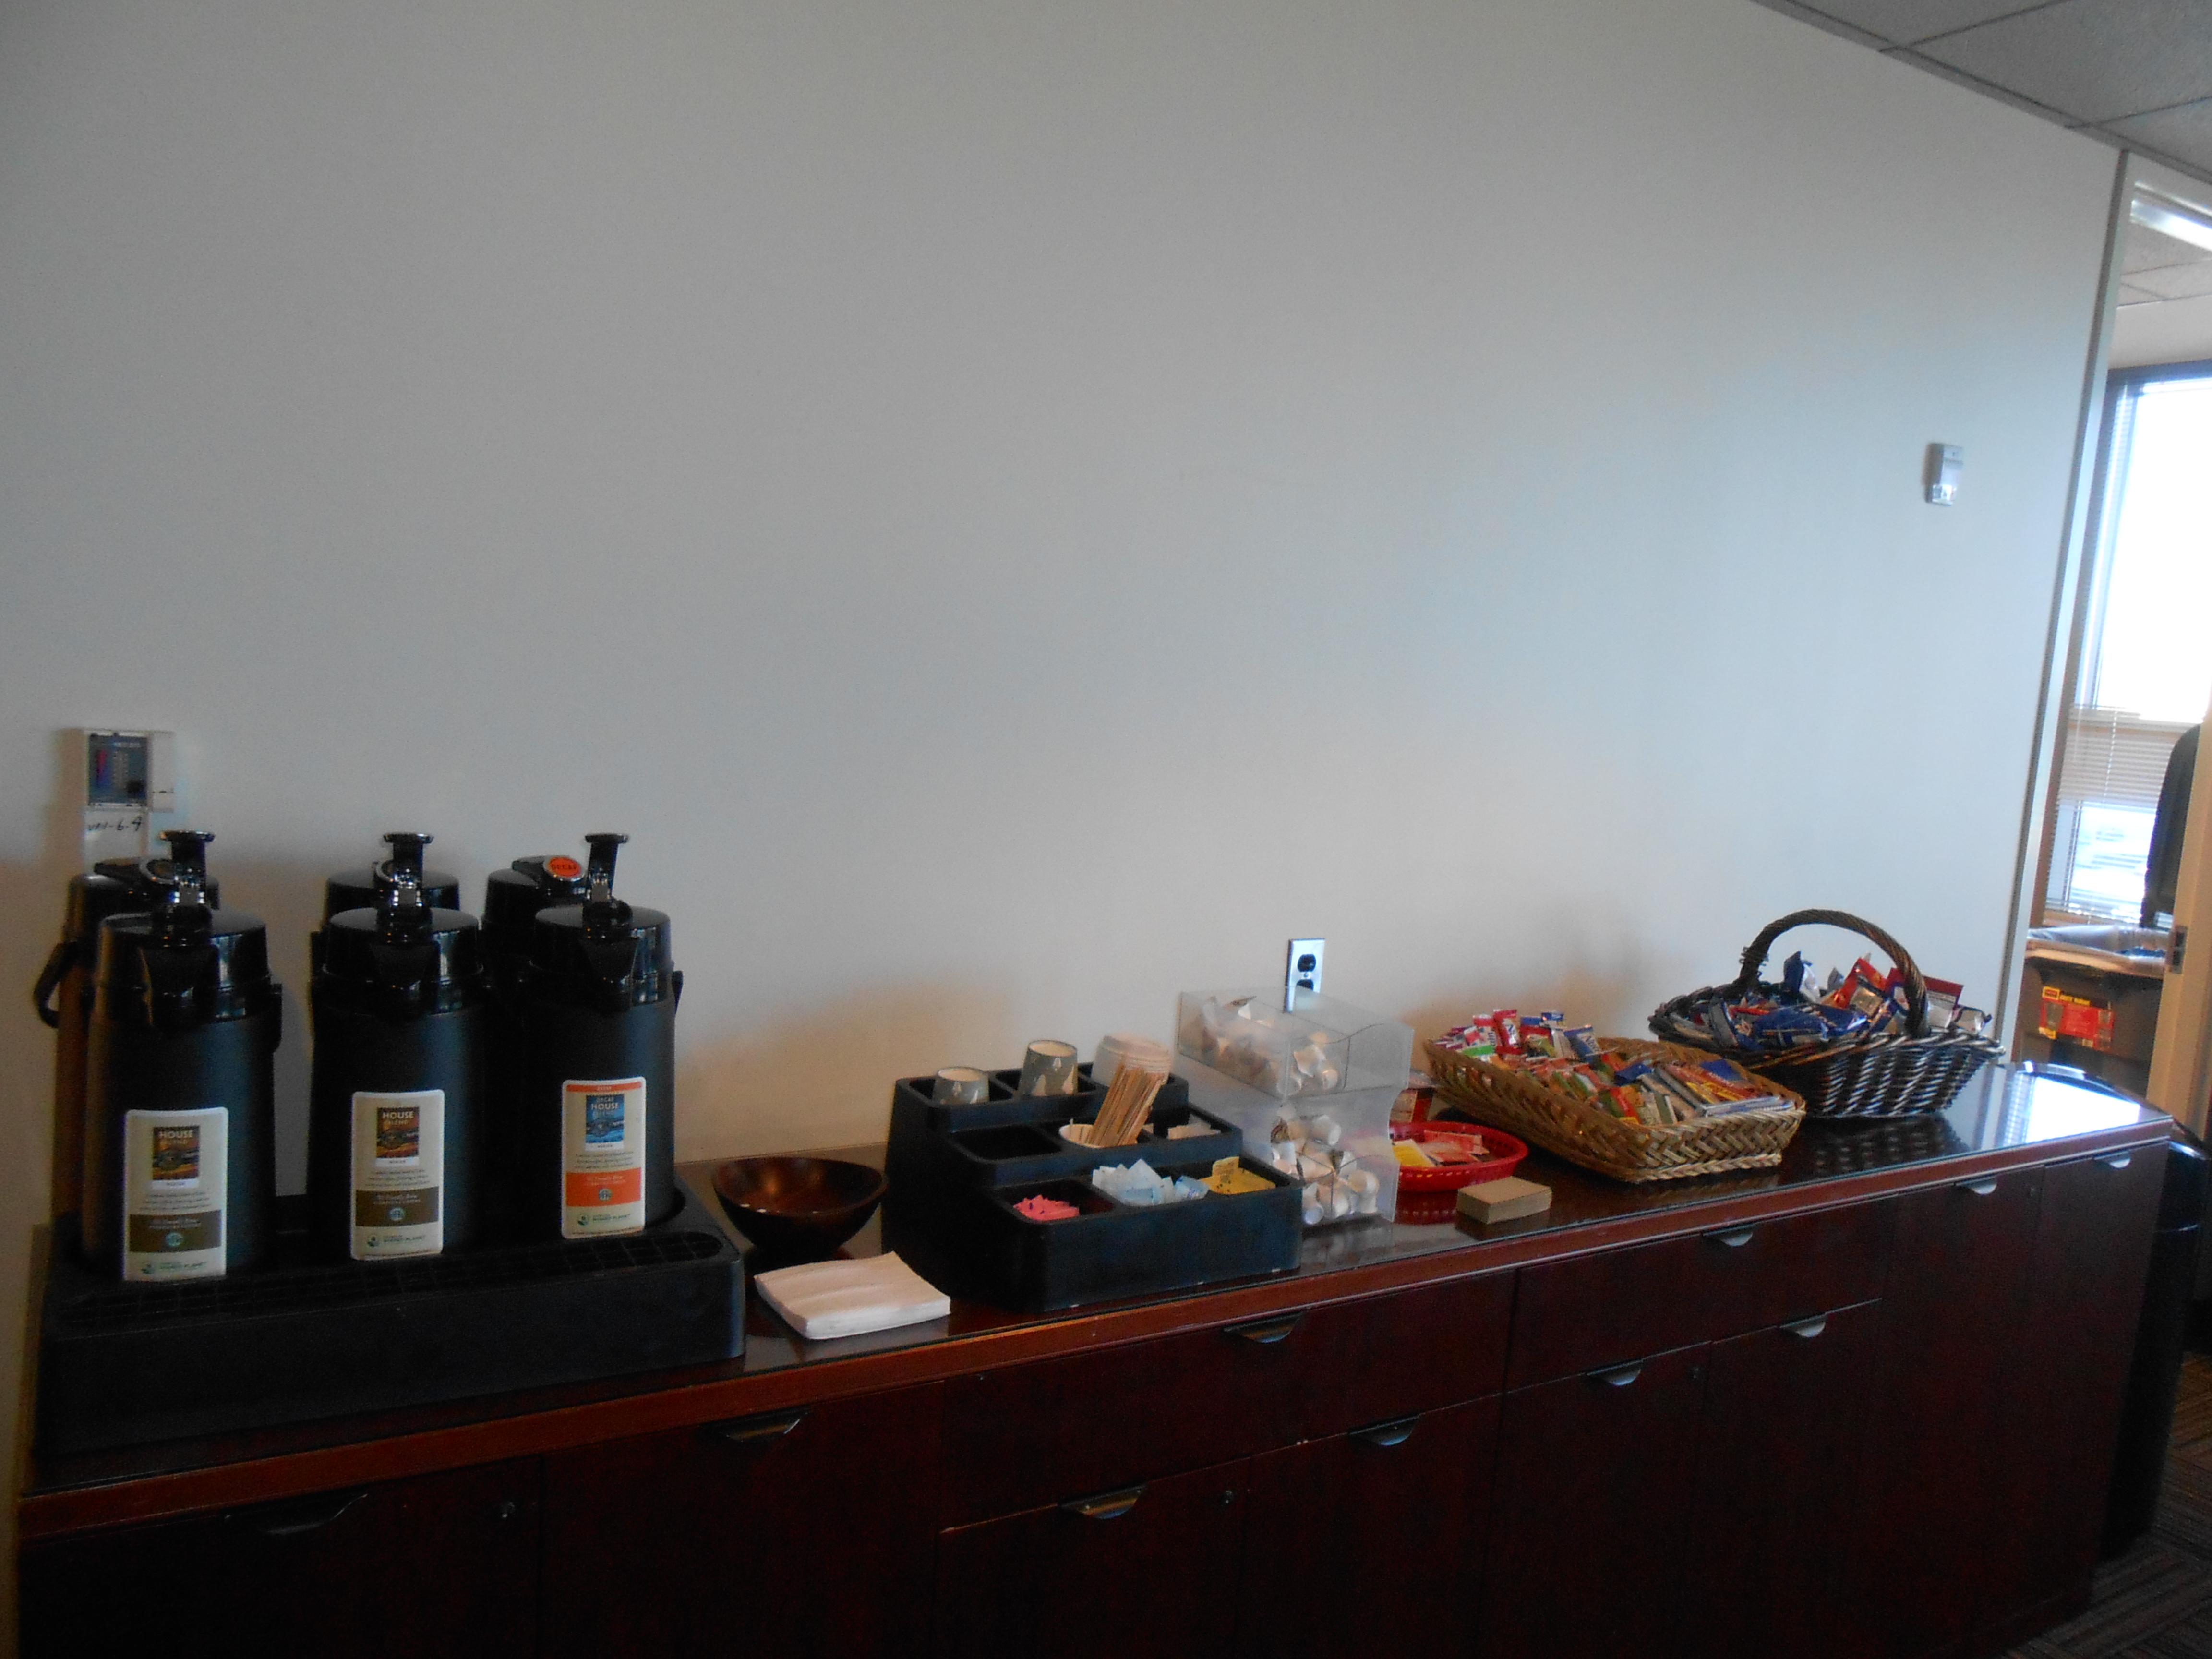 LA Fitness Corporate Office